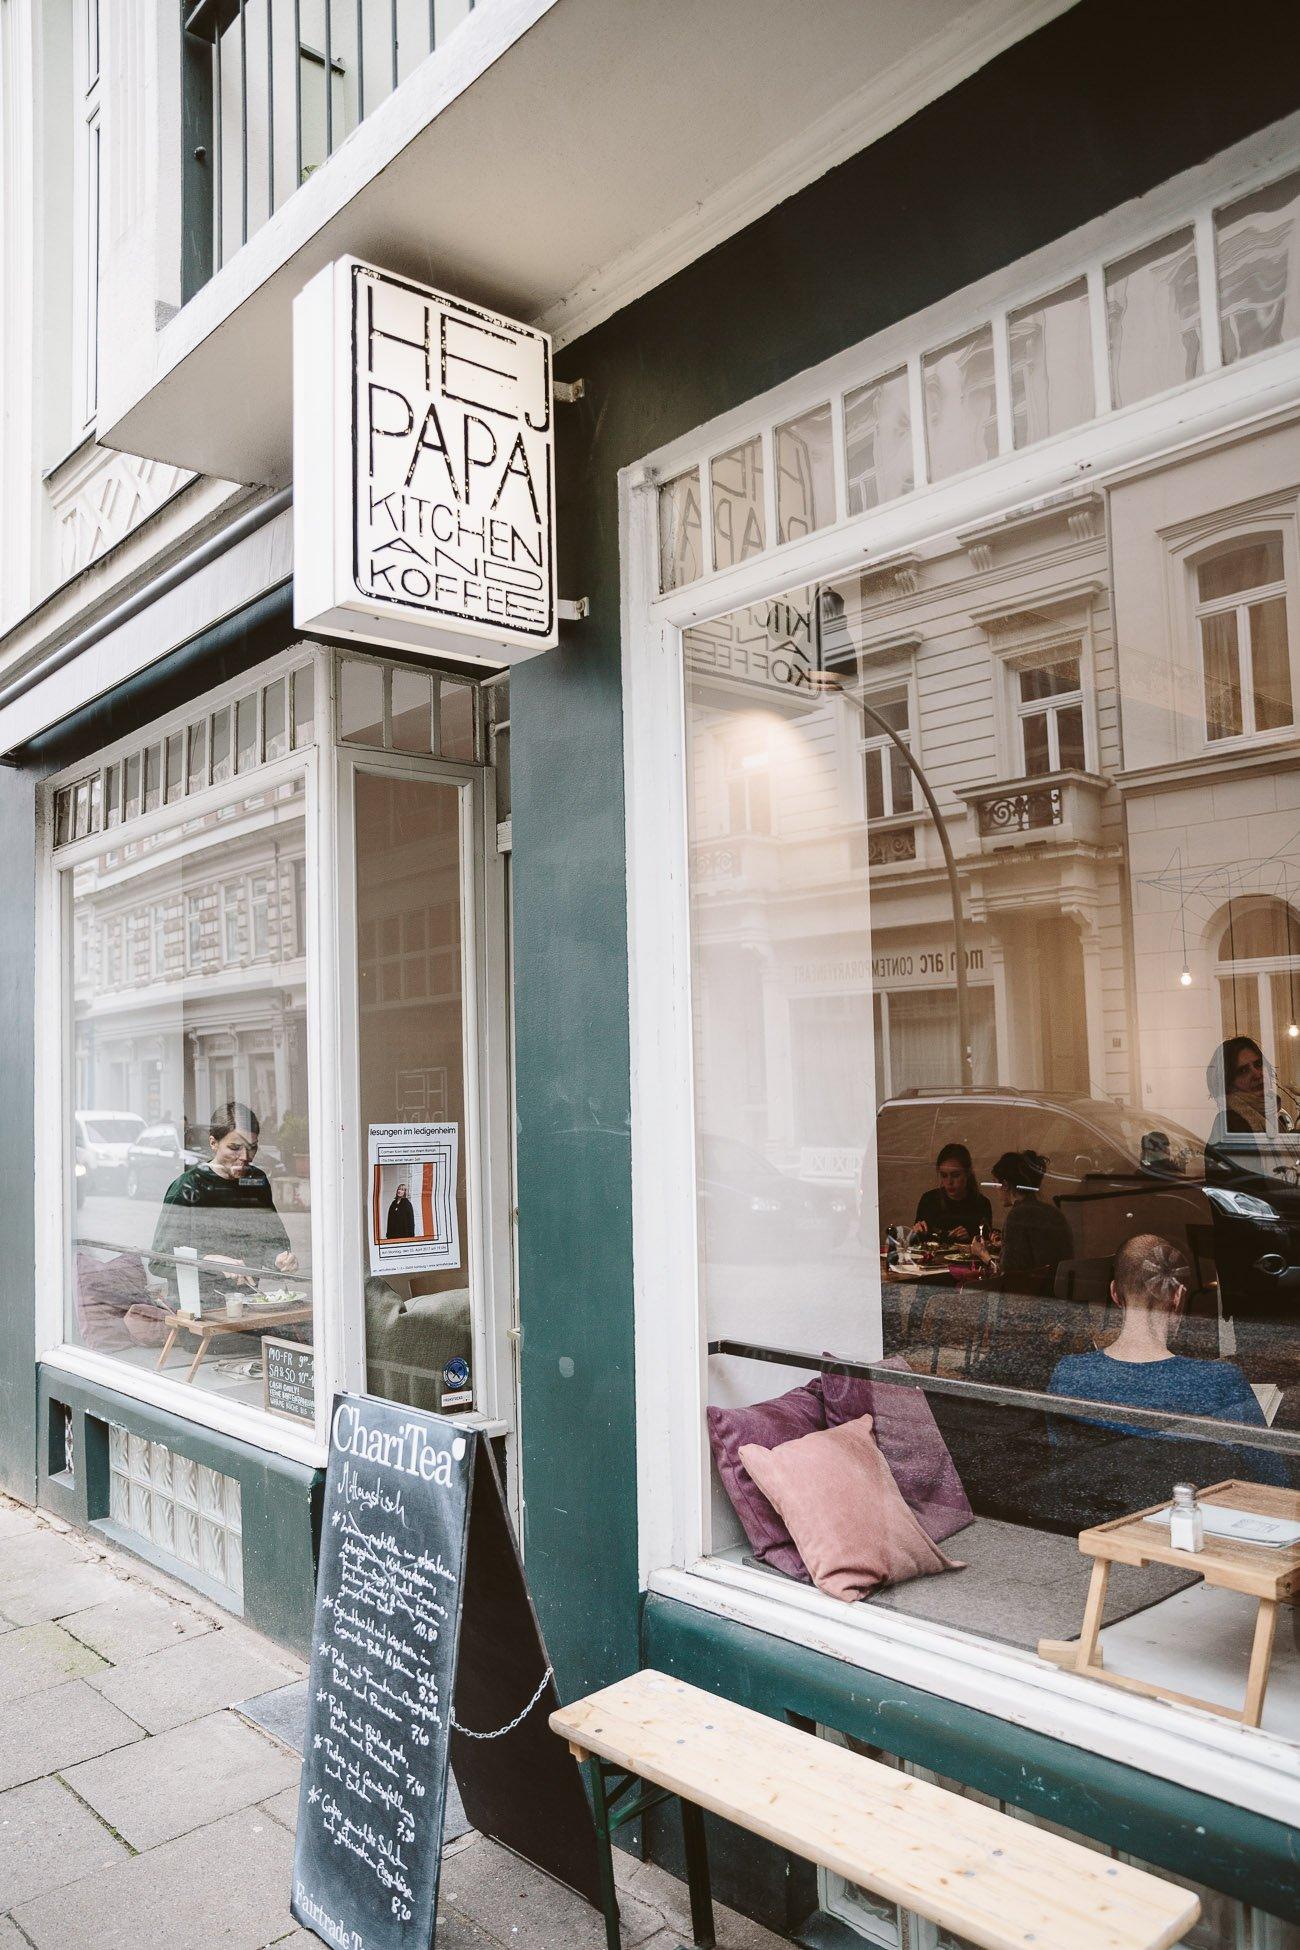 Hej Papa Café in Hamburg